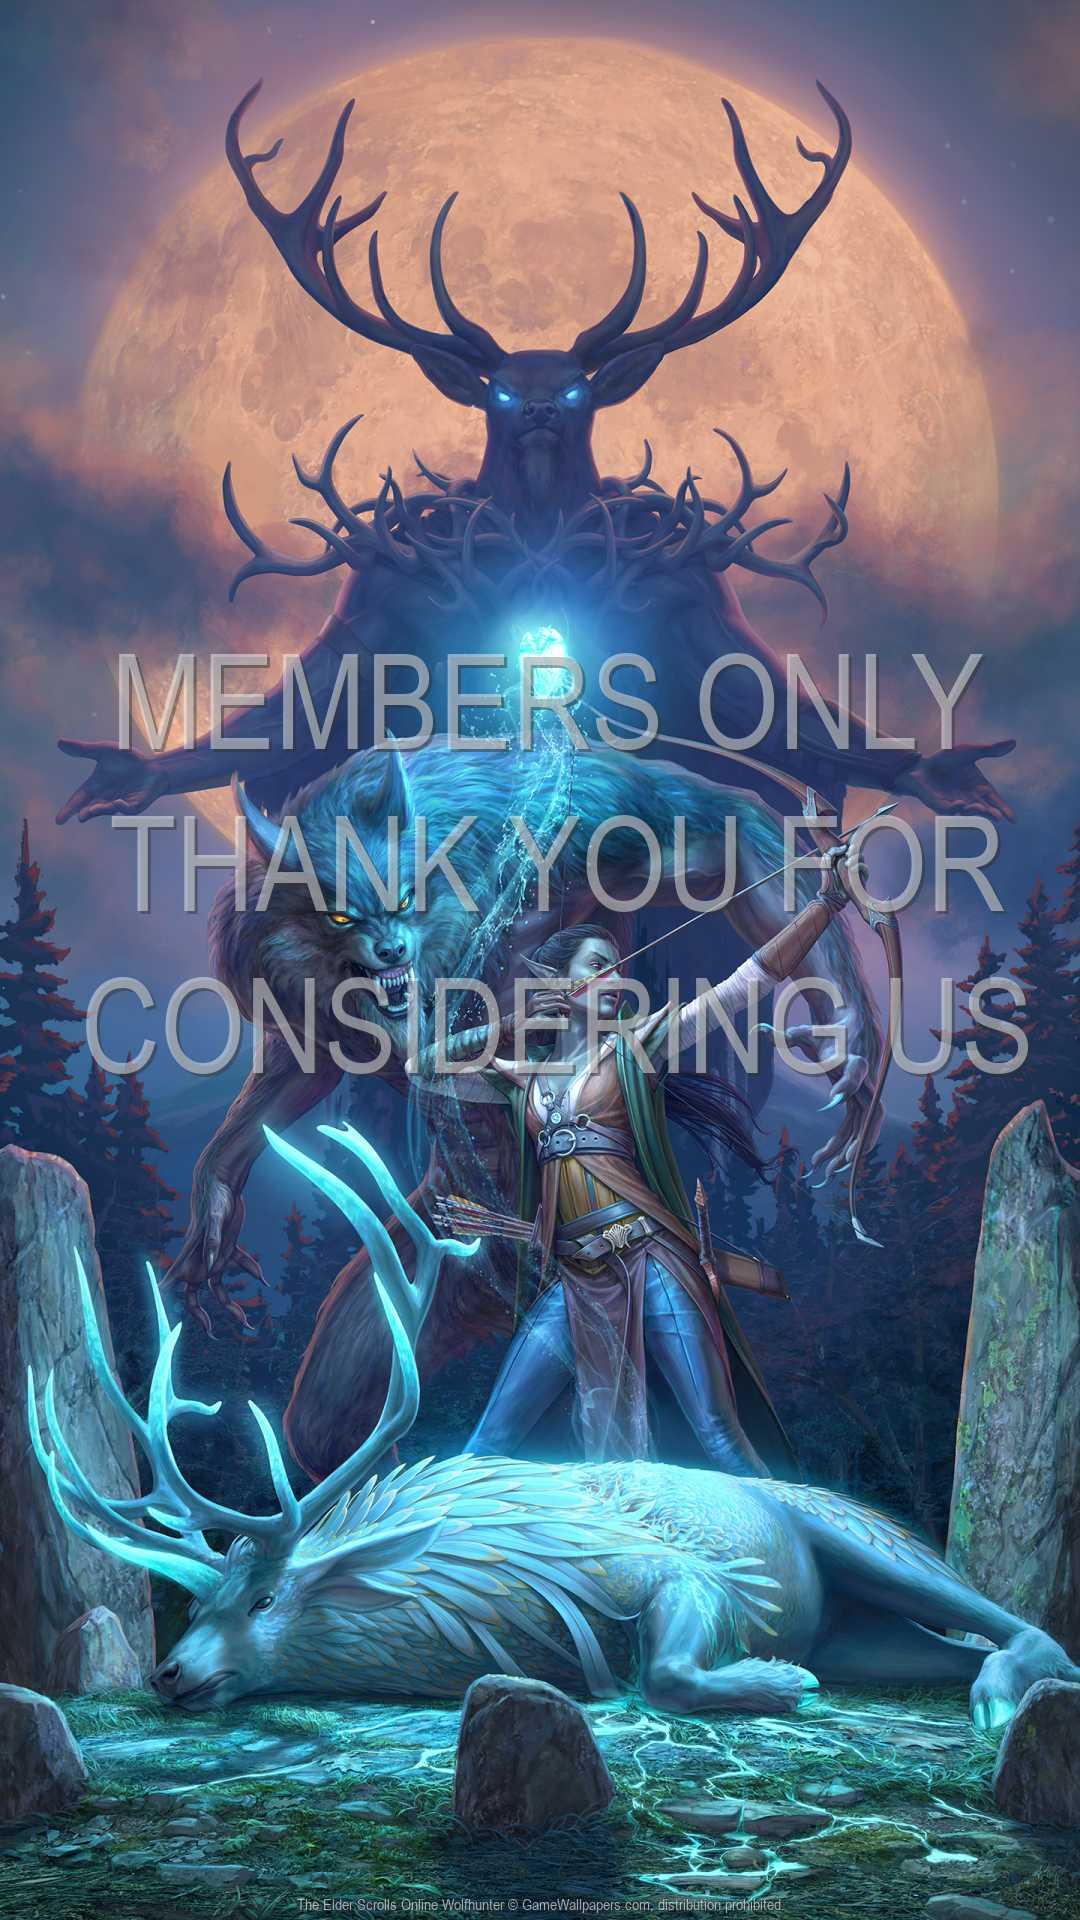 The Elder Scrolls Online: Wolfhunter 1080p Vertical Mobile wallpaper or background 01